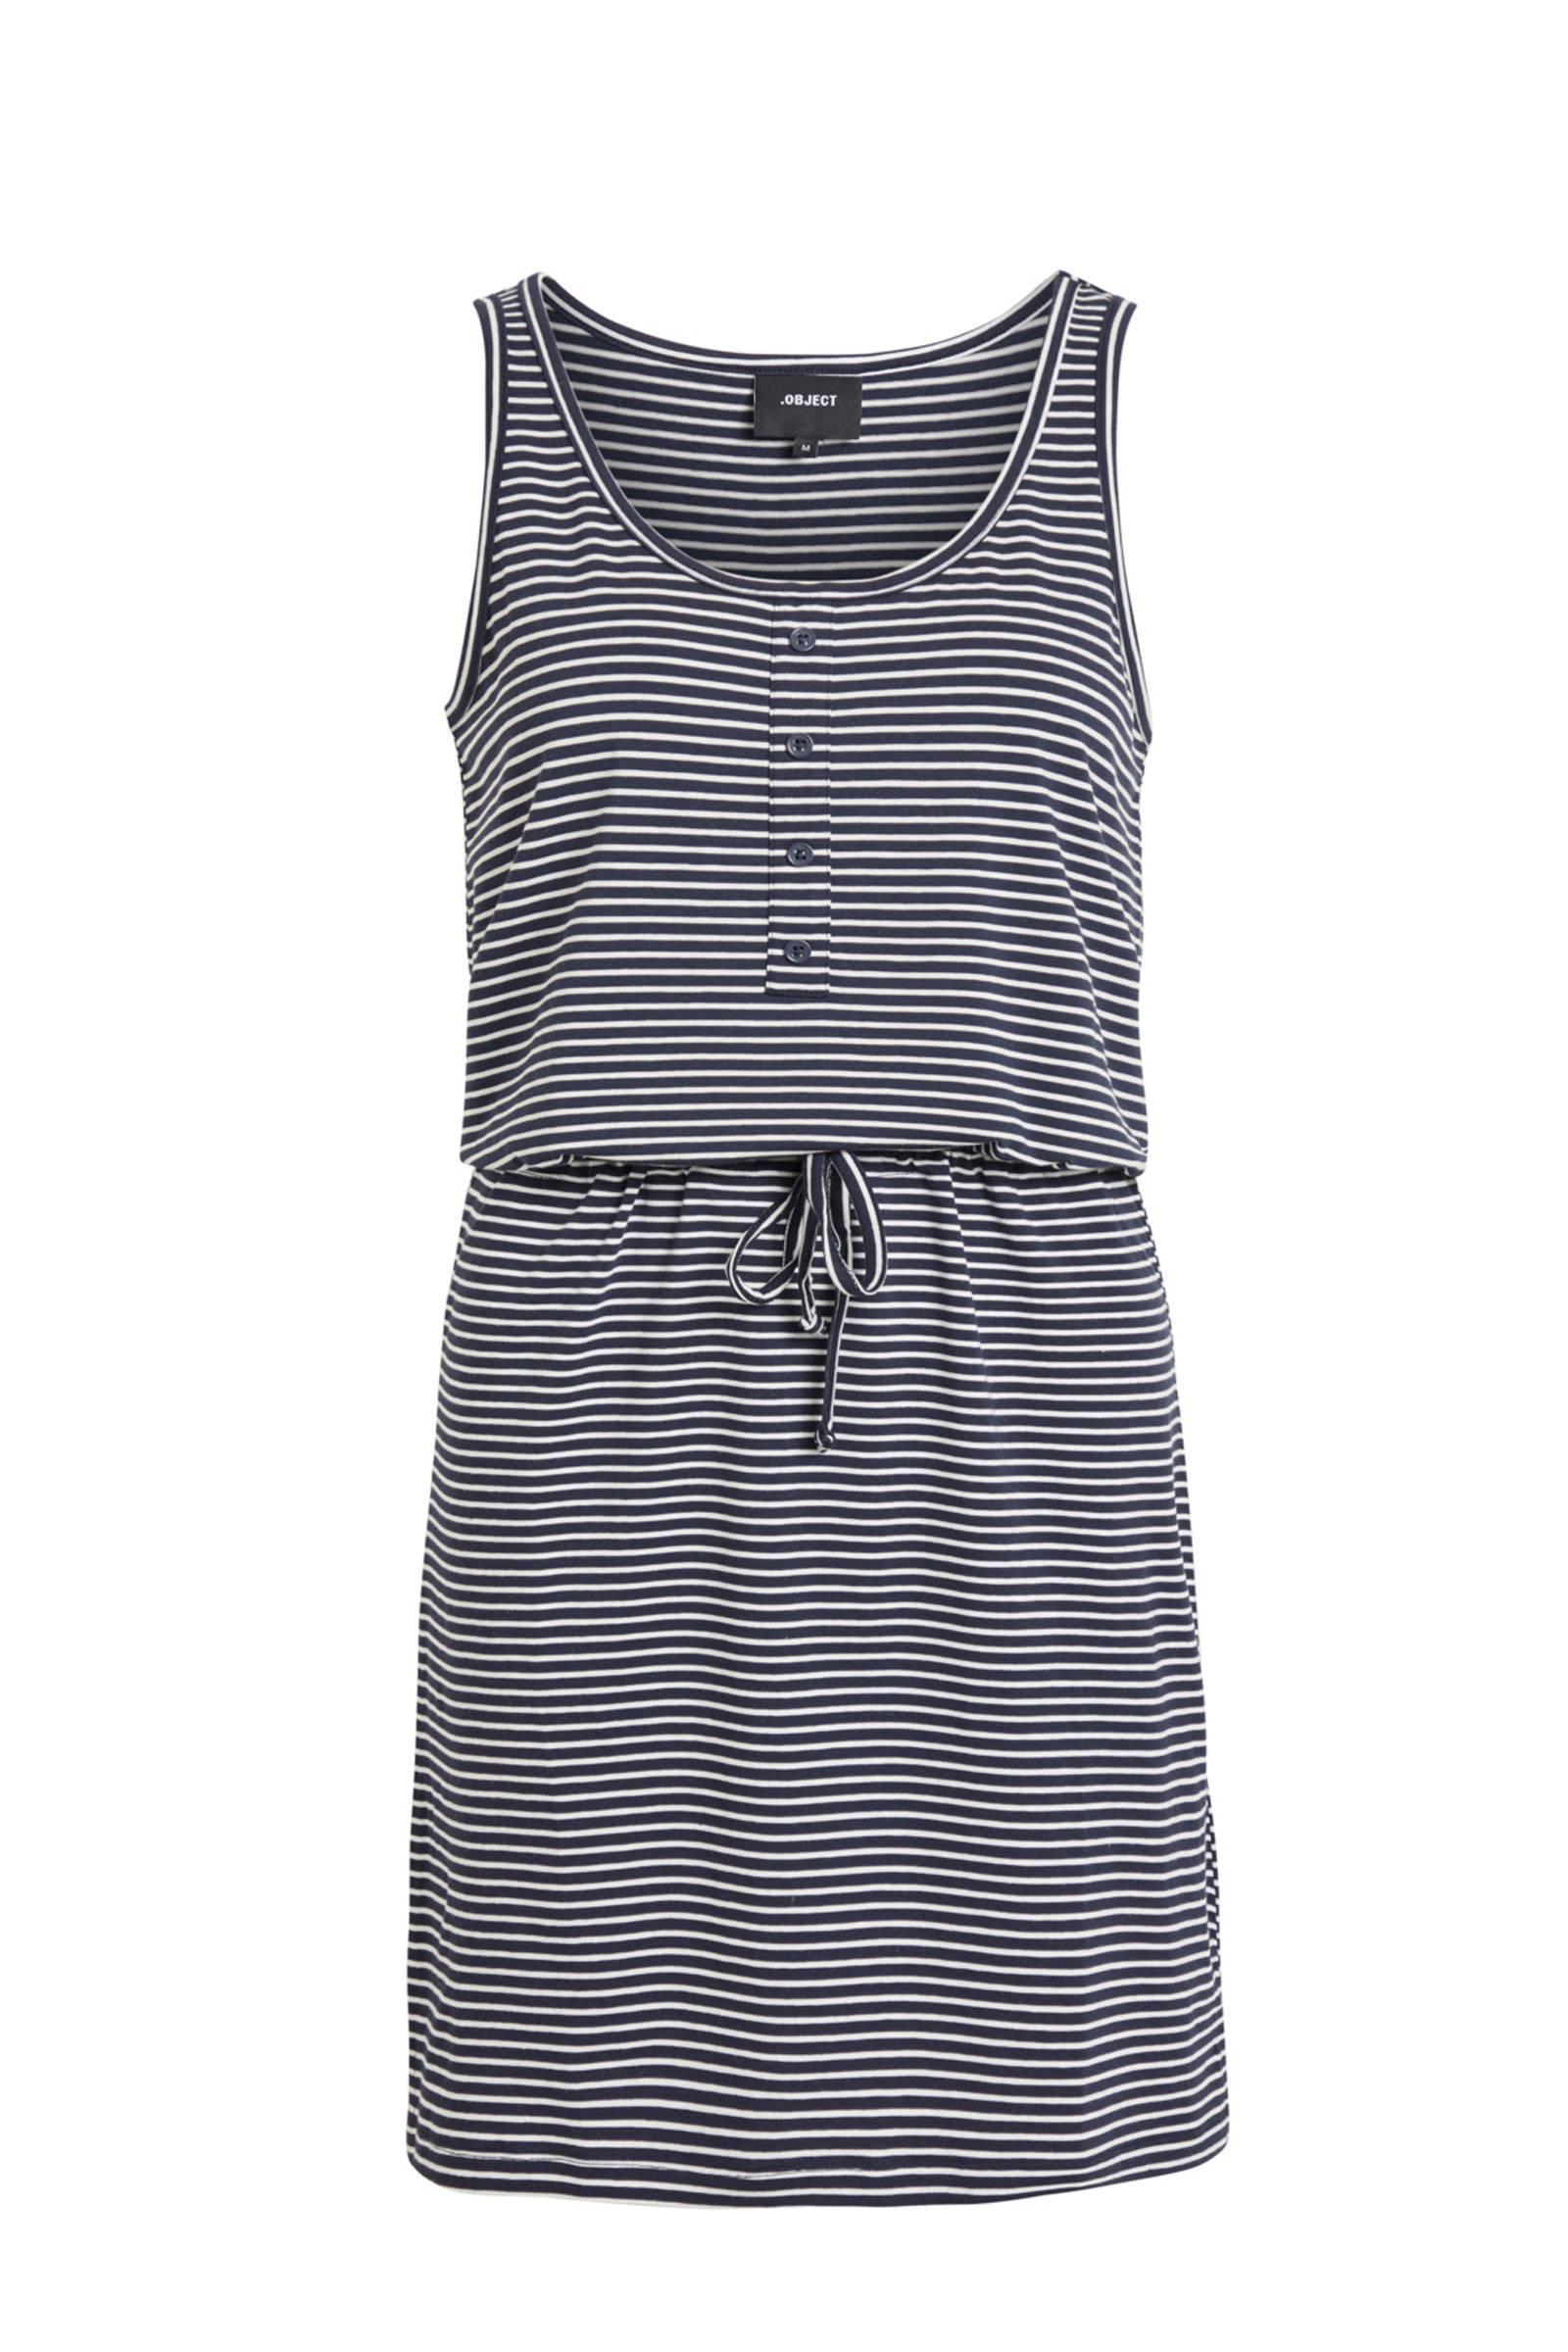 object kleding wehkamp